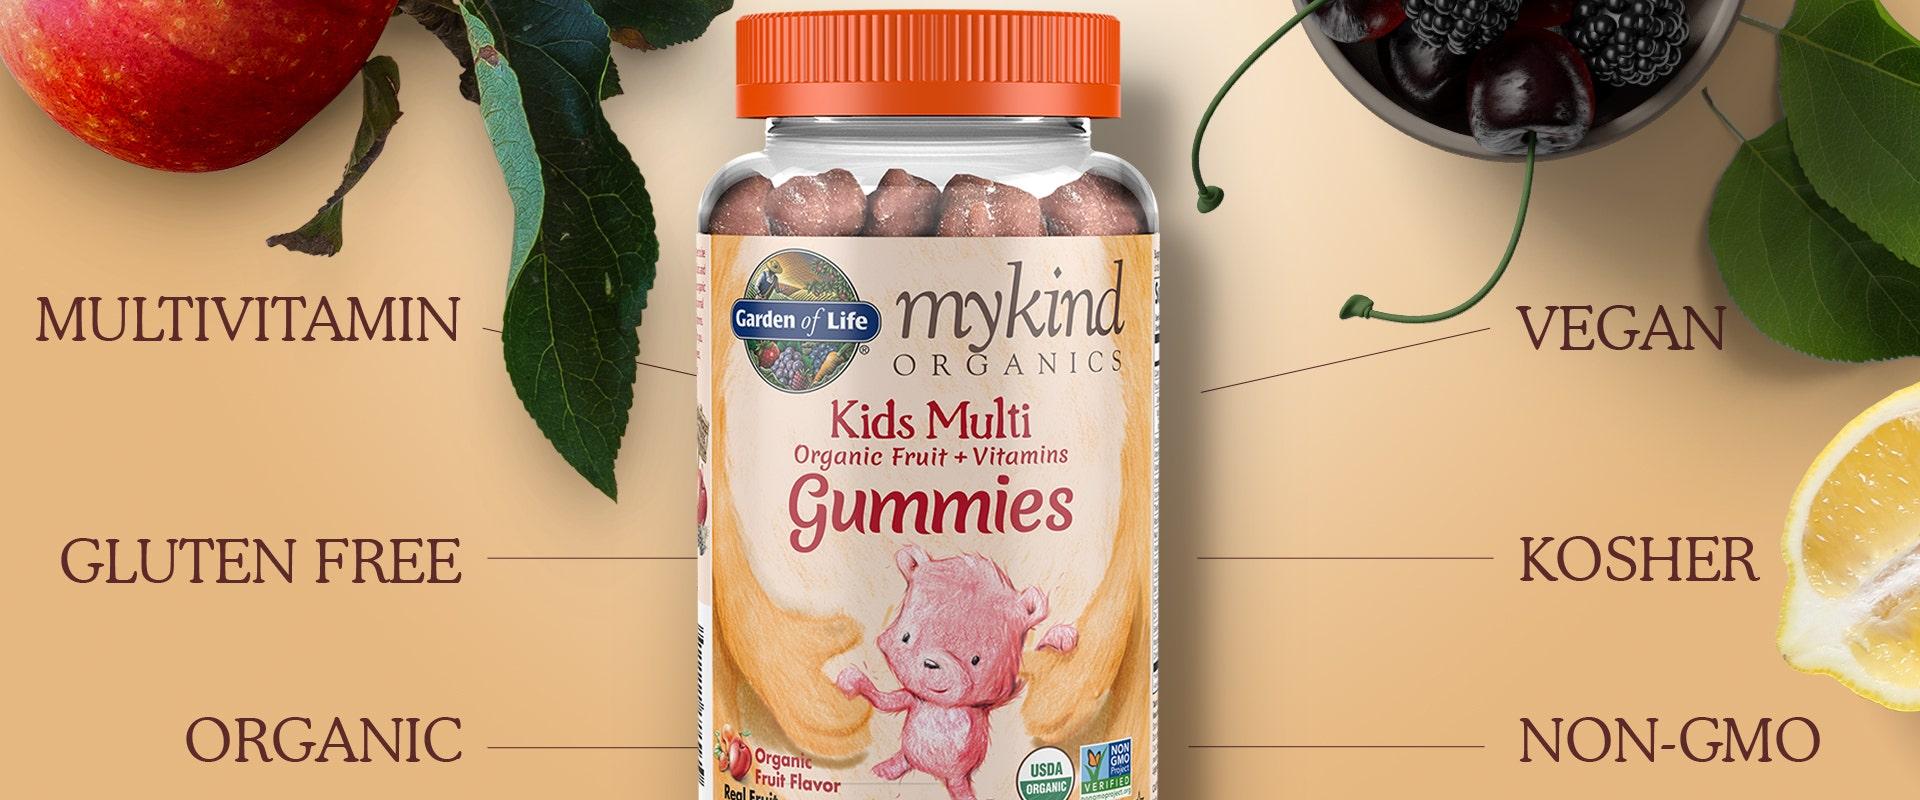 Garden of Life mykind Multi Vitamin Kids Gummies